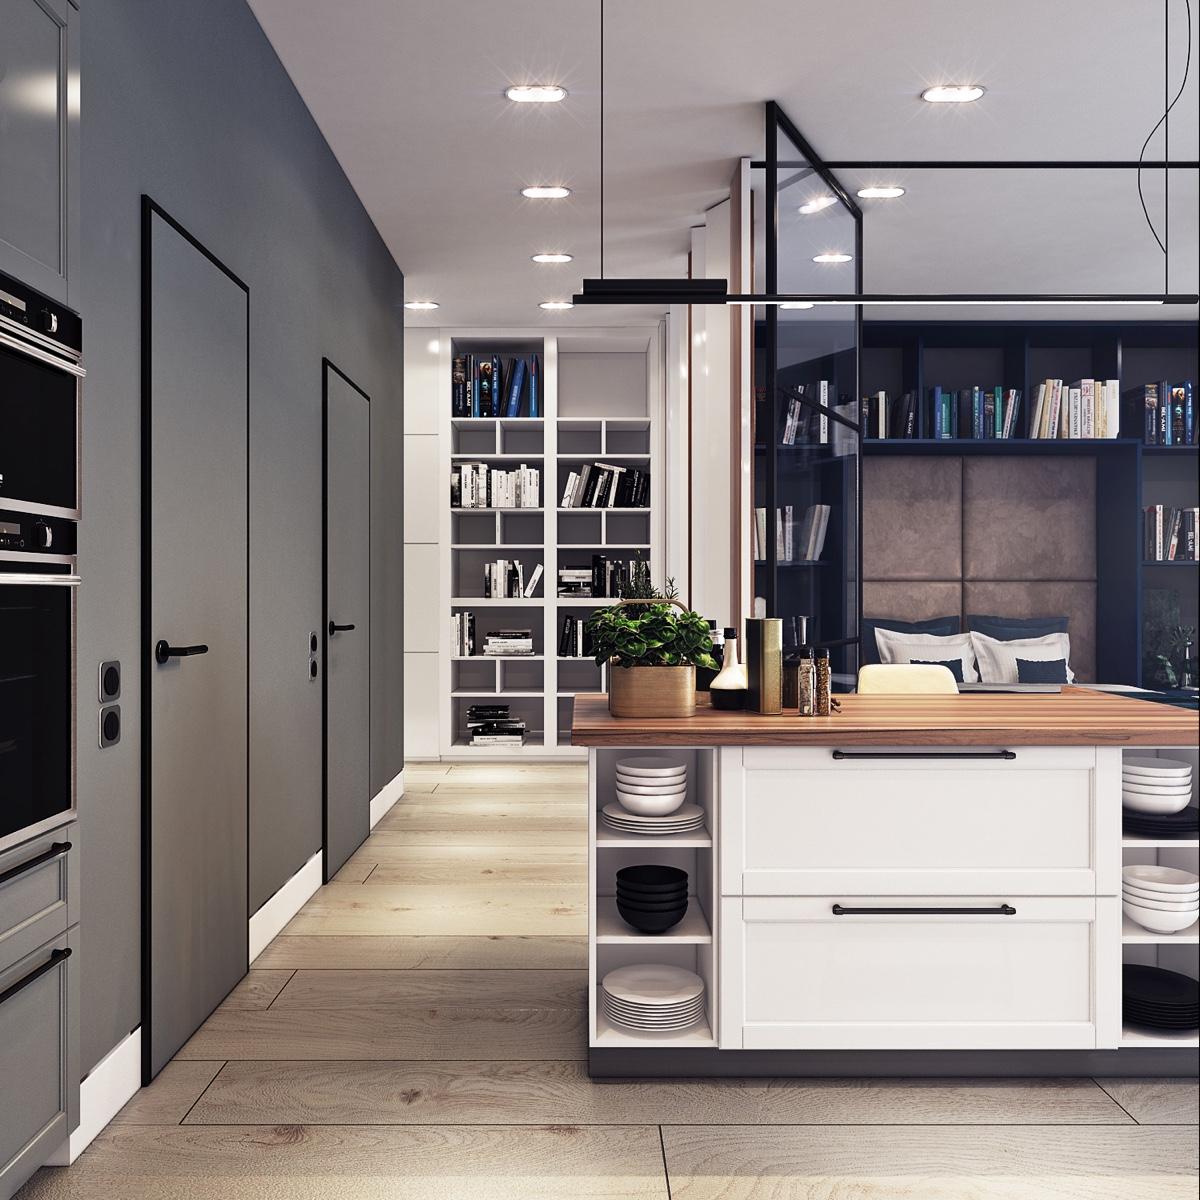 Beautiful Studio Apartment Designs Combined With Modern: 5 Beautiful Studio Apartments